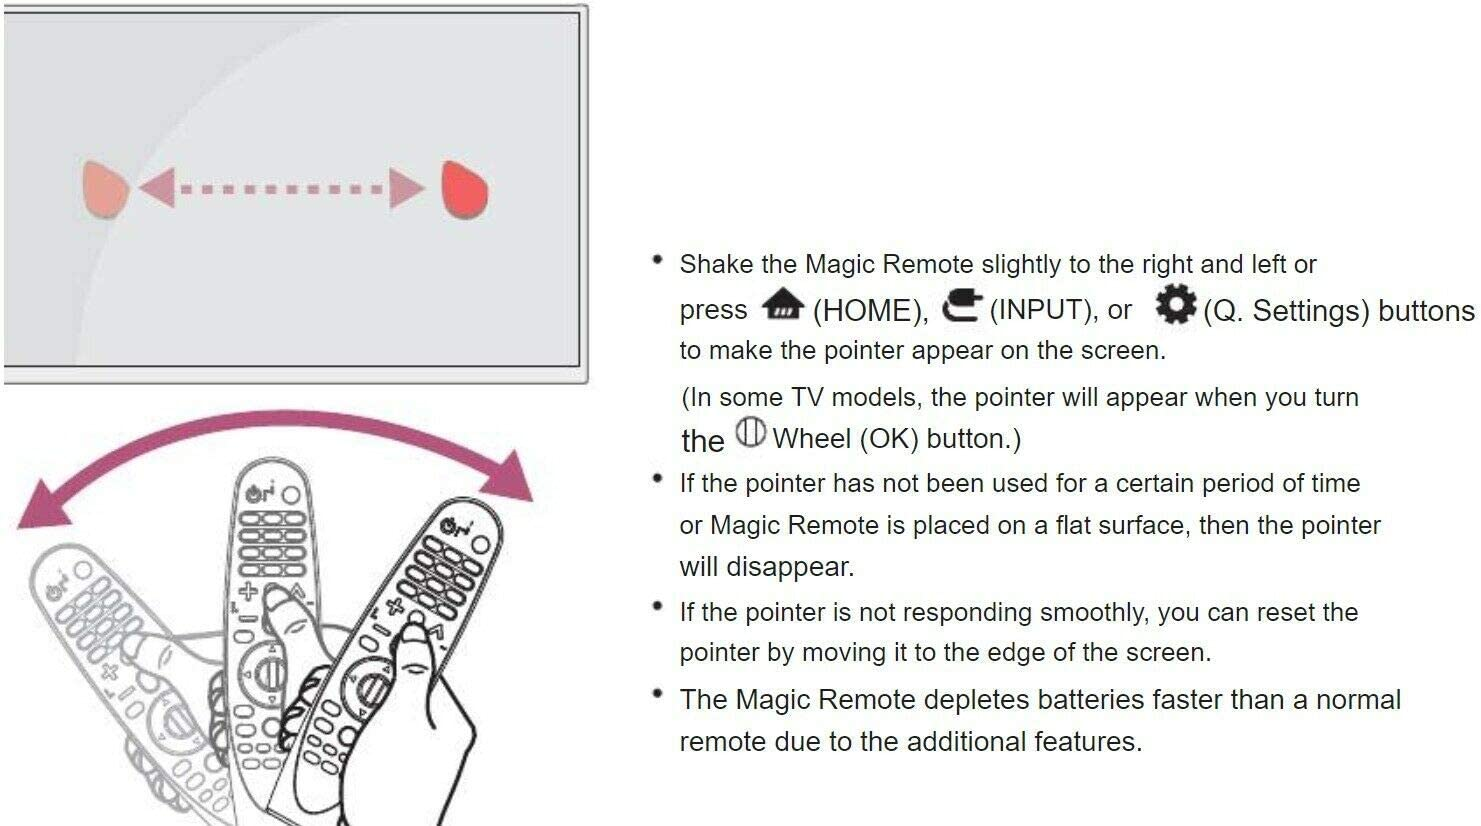 Replacement TV Remote Control Controller for LG Electronics OLED55B8PUA OLED65B8PUA 4K Ultra HD Smart OLED TV 2018 Model